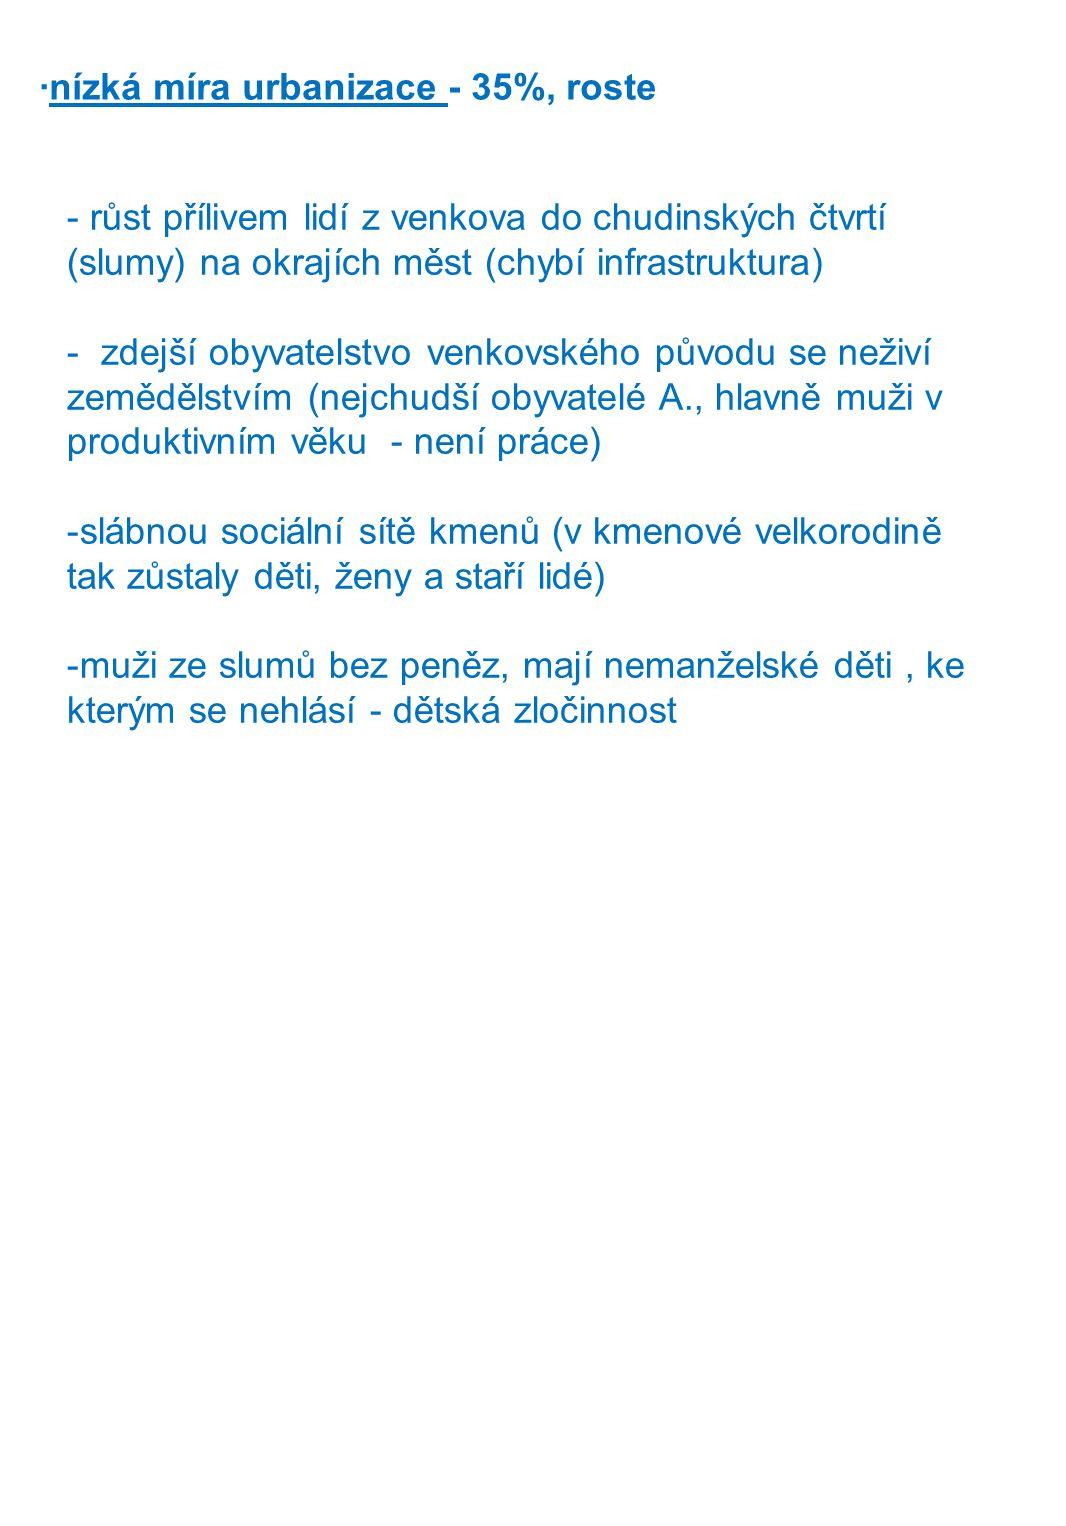 http://national-geographic-cz.imag3box.net/wp- content/uploads/articles/thumb1_18337_2773_sudan-darfur-6-e1335446847679.jpg Súdánci